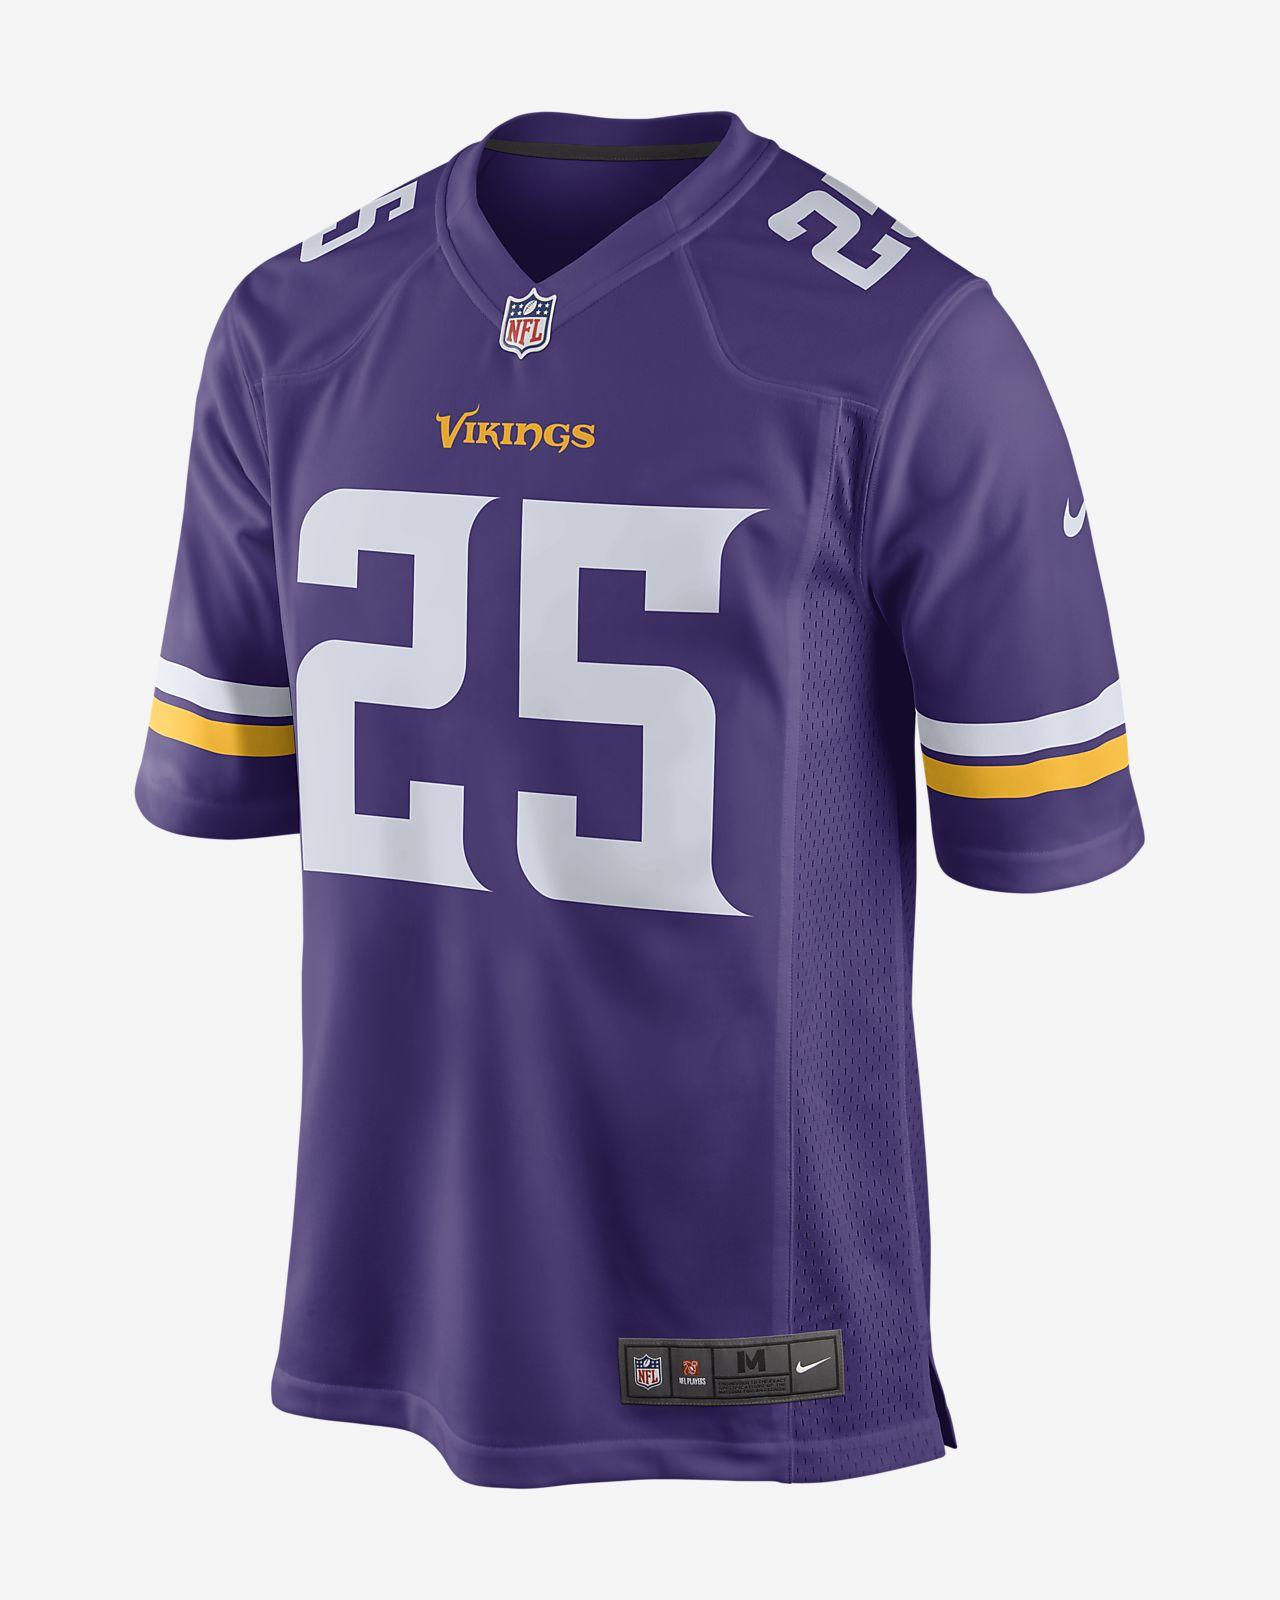 Vikings Américain Football Nfl De Minnesota Domicile Maillot zYwE8Zqq